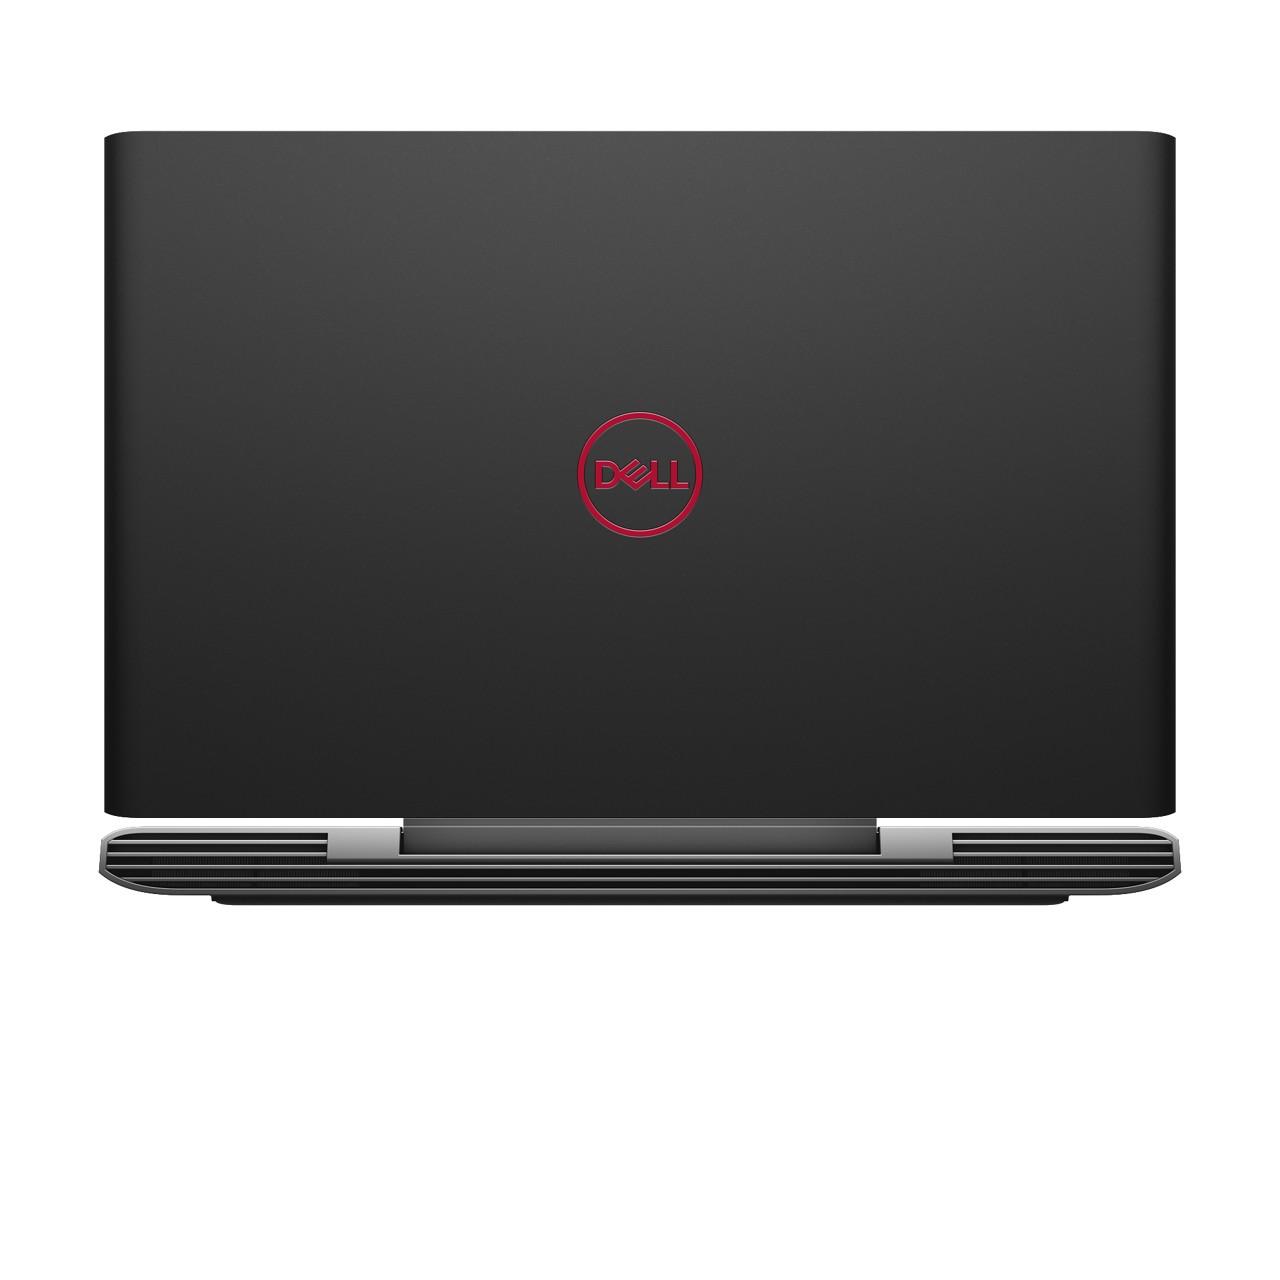 Dell Dell G5 15 Gaming Laptop Gtx 1050 Ti I7 8750h 128gb M 2